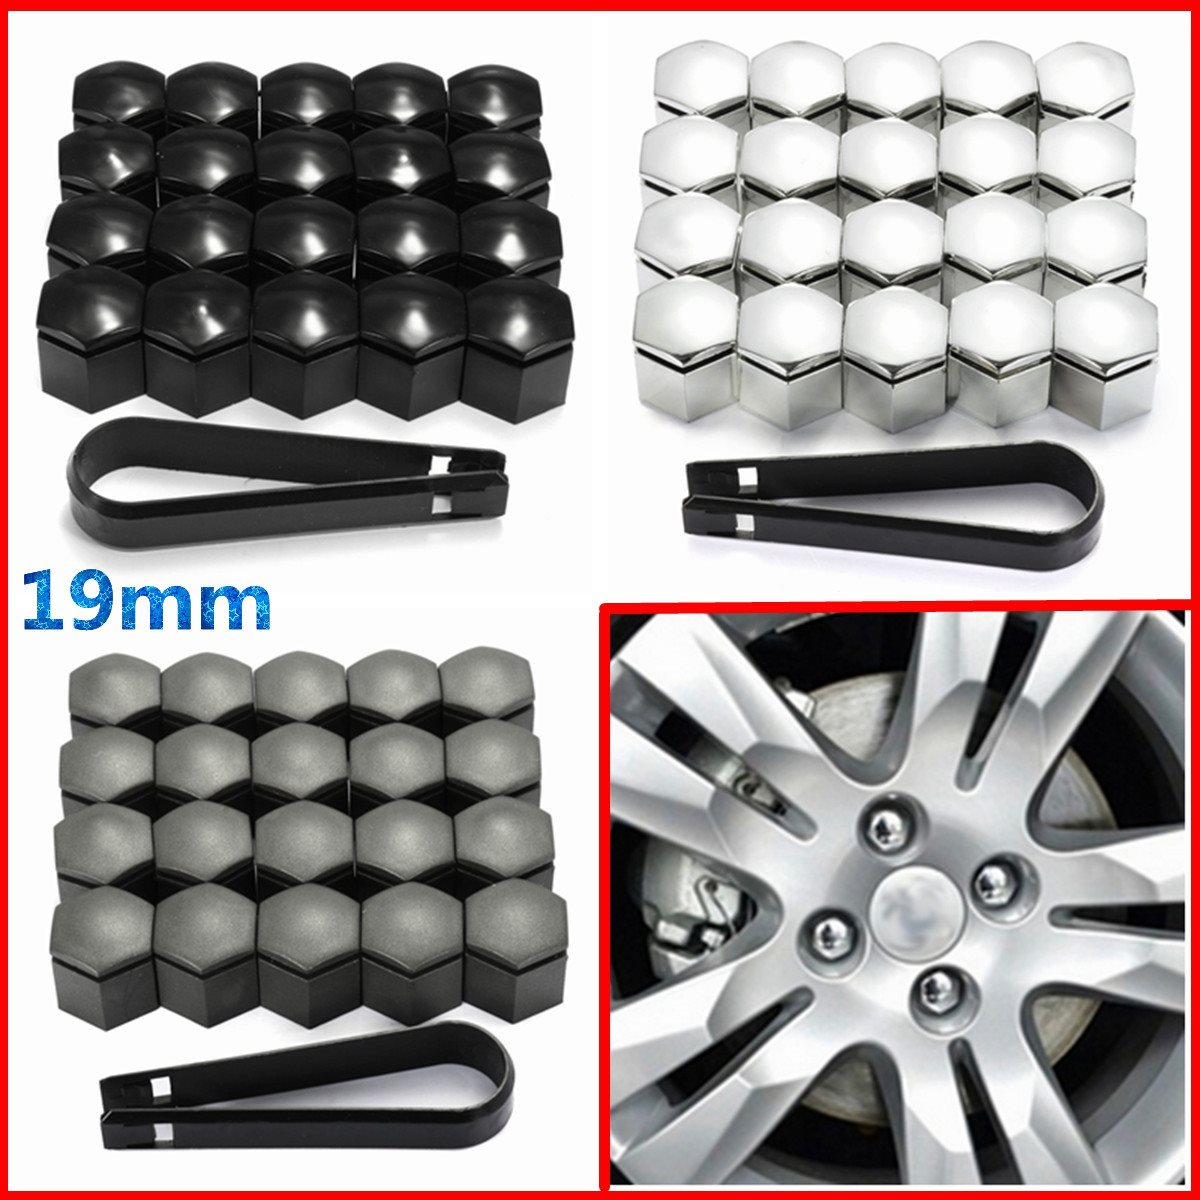 20pcs 19mm Wheel Nut Cover Bolt Cap Protector For Vauxhall Opel Romove Tool Key